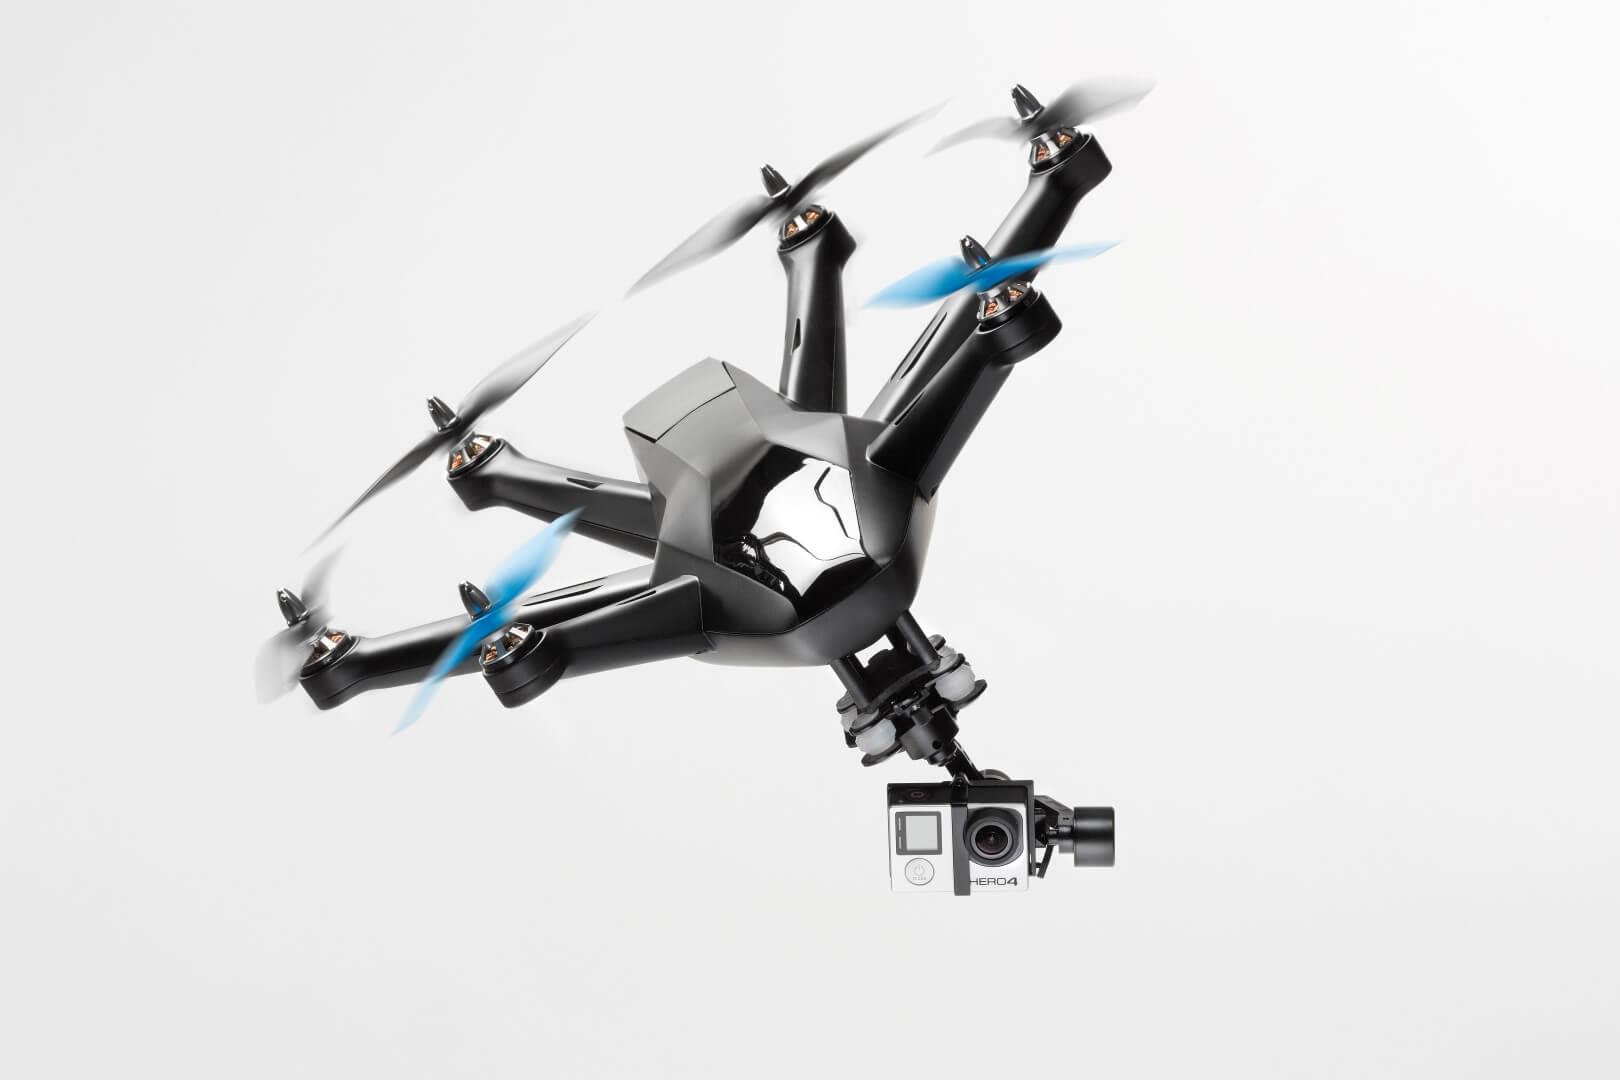 Professional Auto Follow Camera Drone_Online Camera